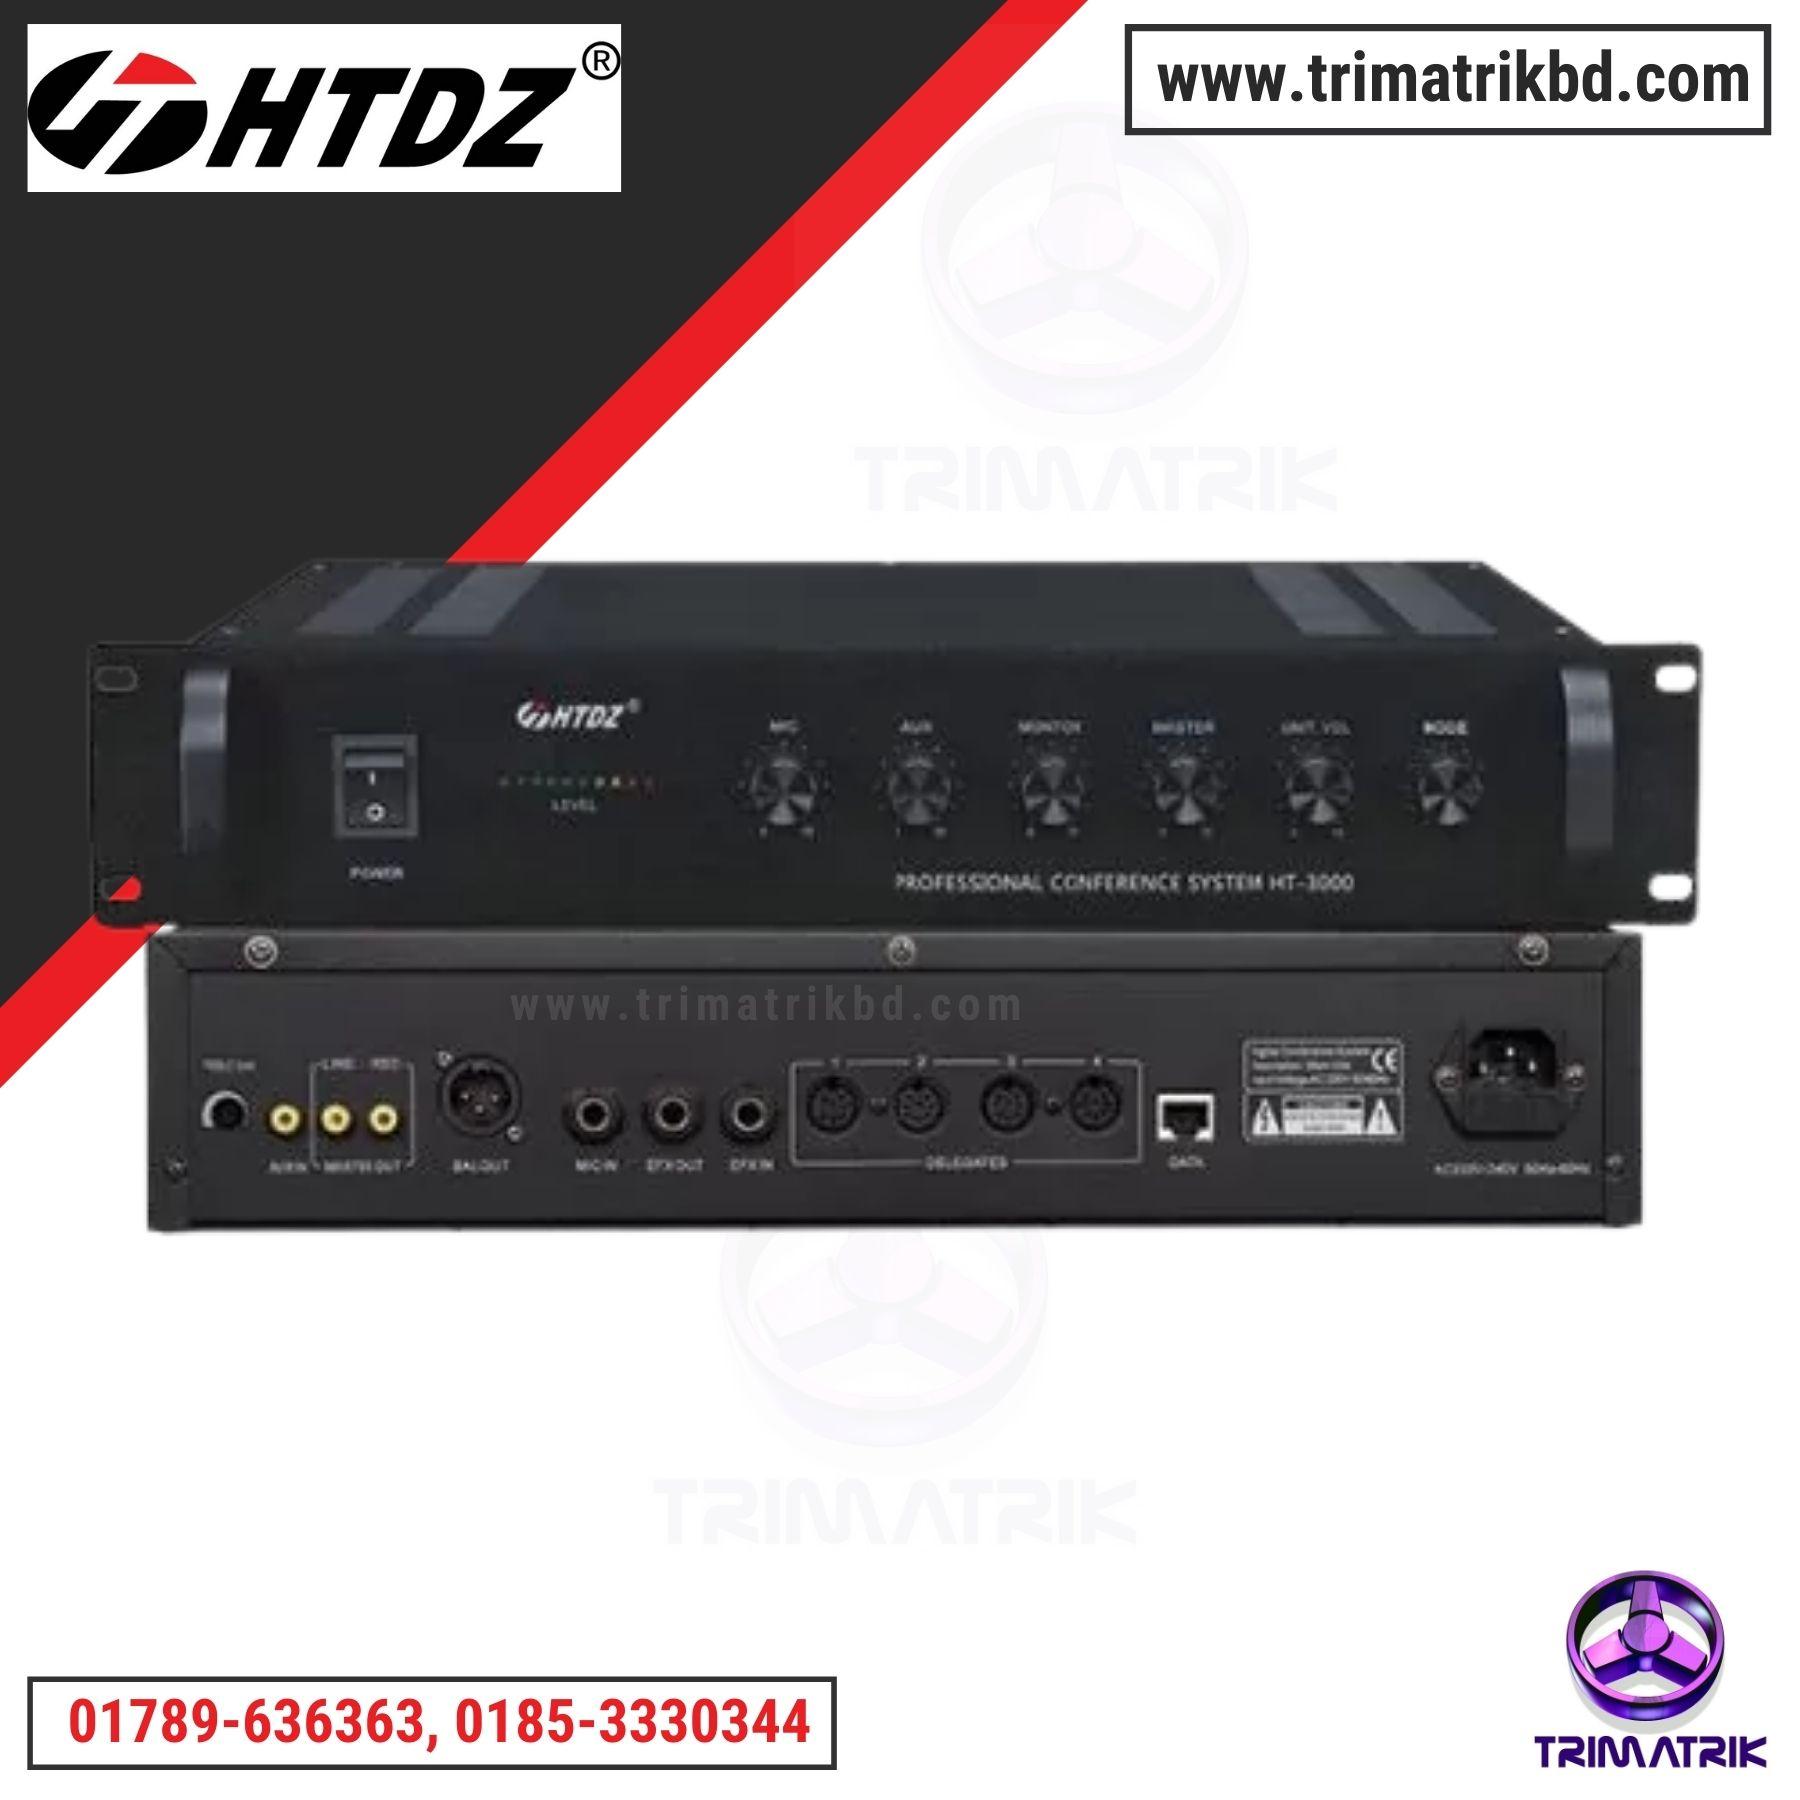 HTDZ HT-3000 Bangladesh